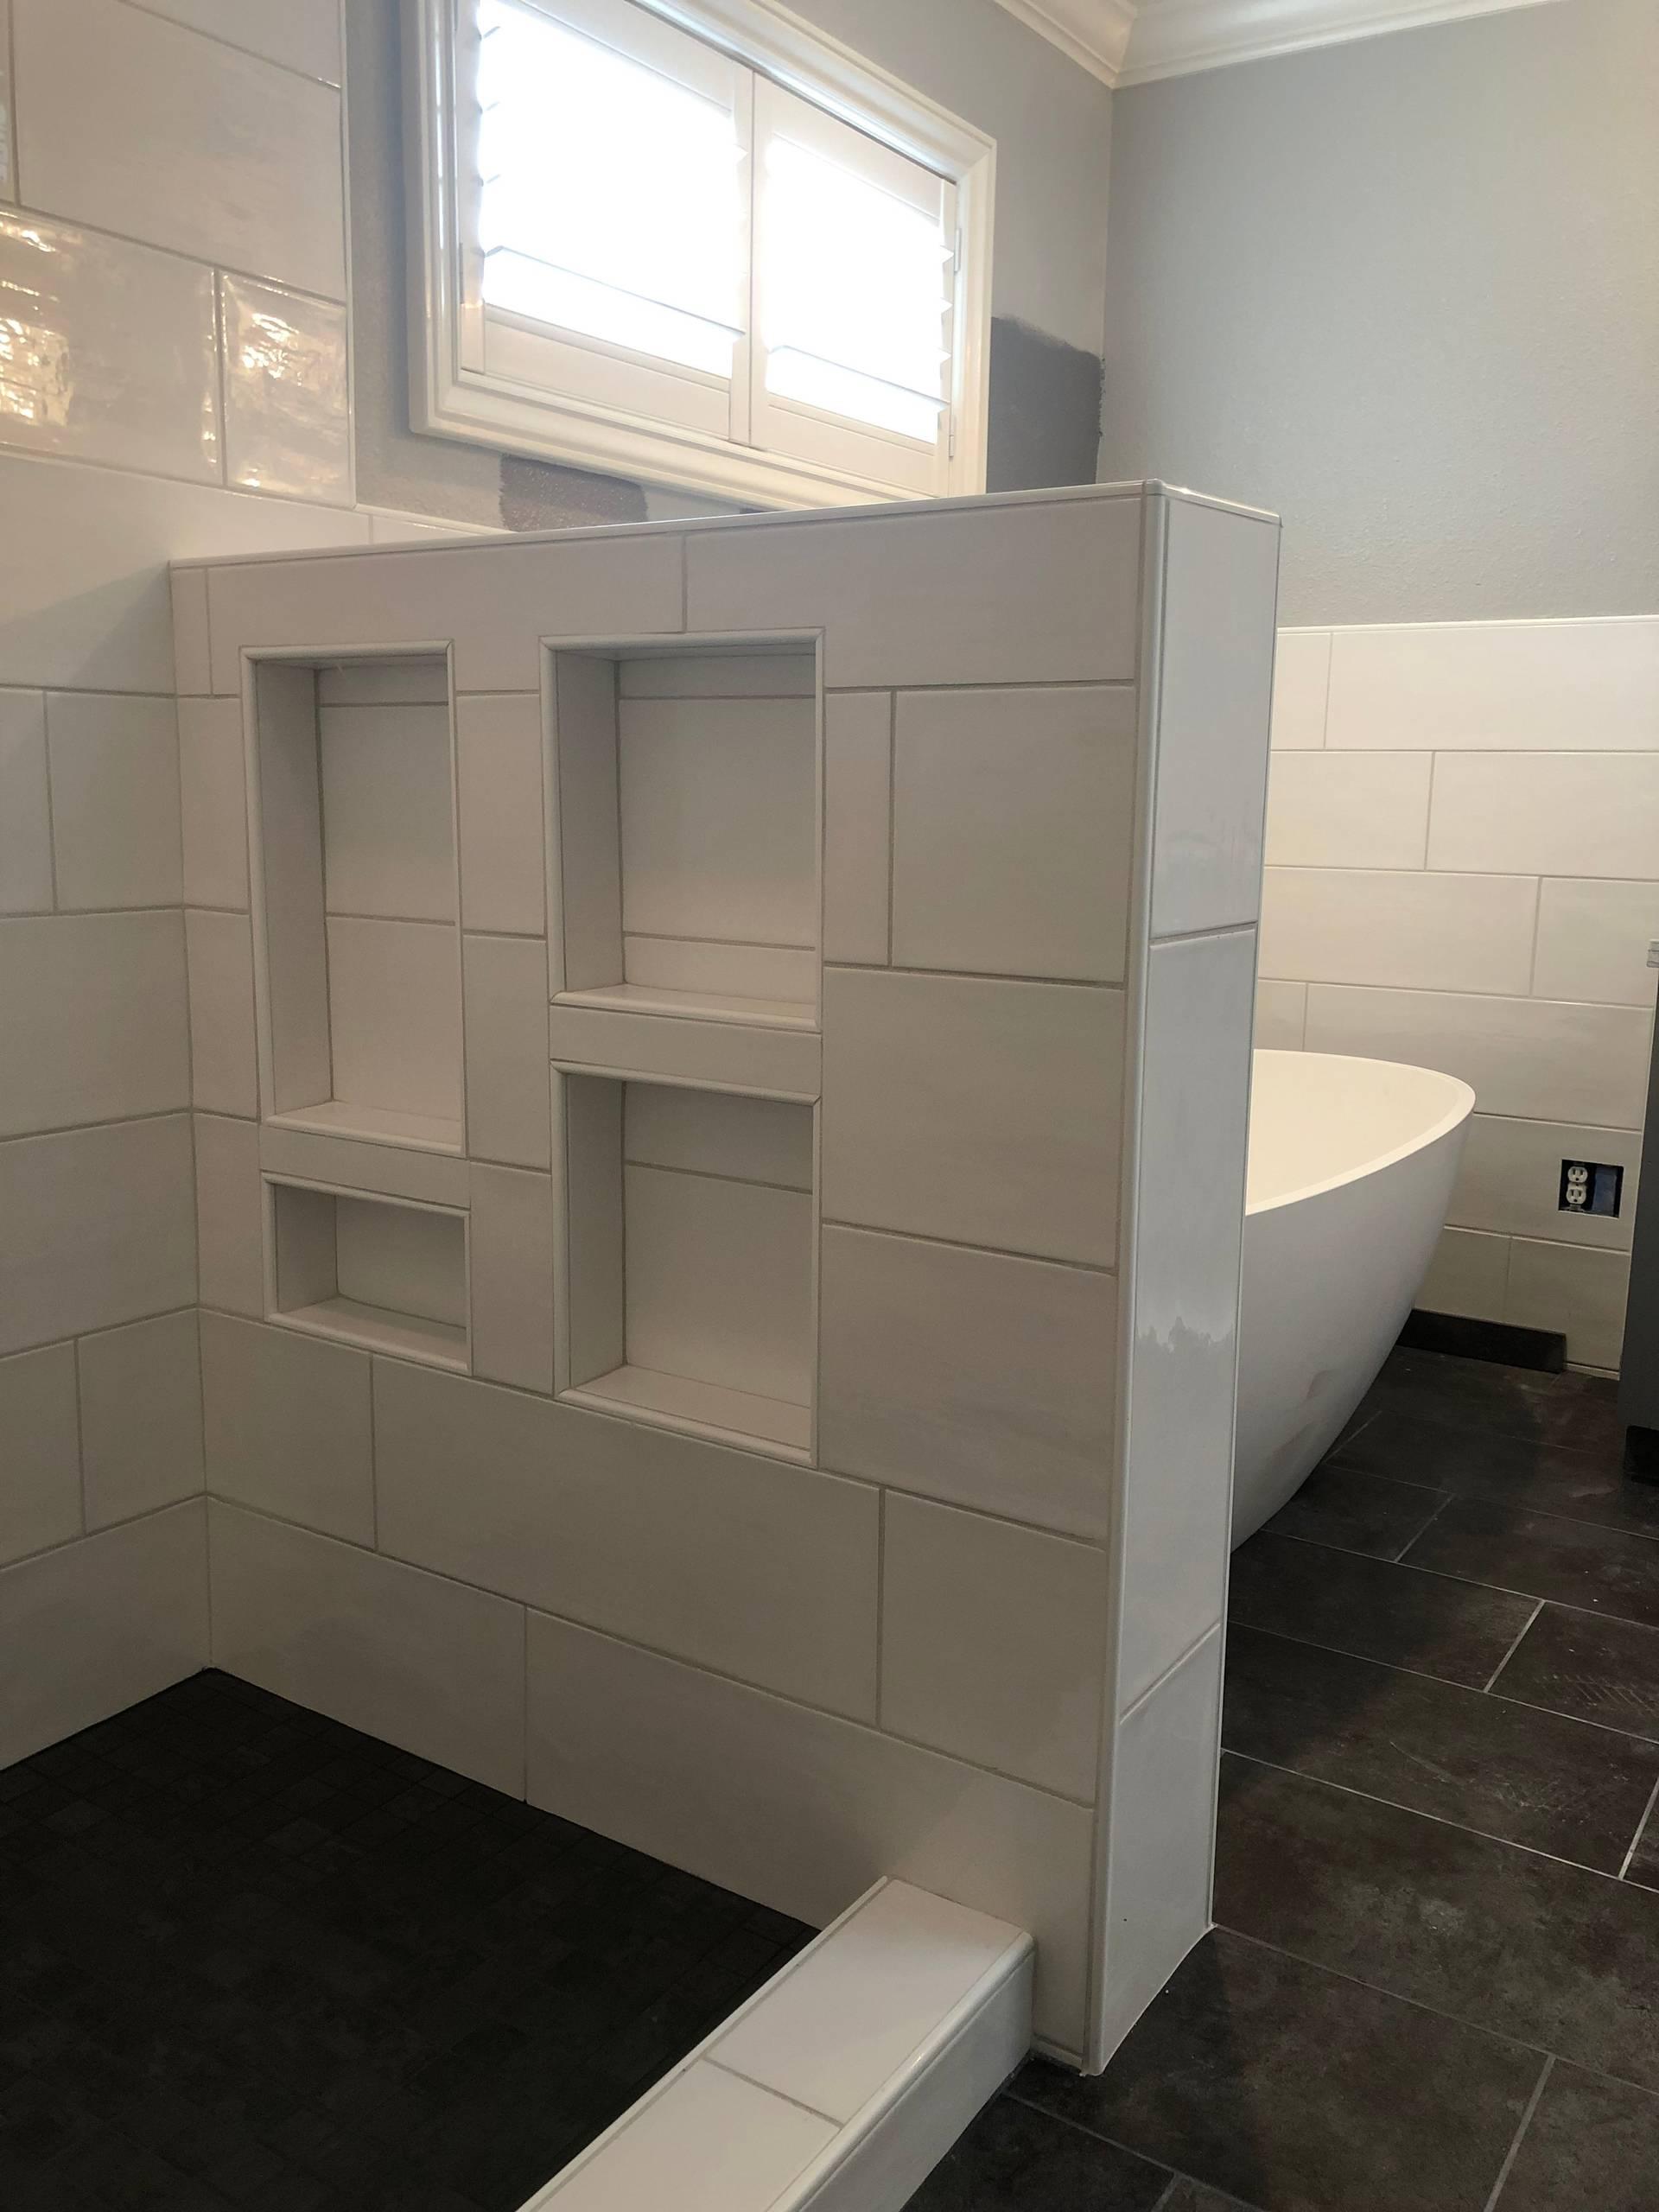 Large-Format Subway Tile, Master Bath